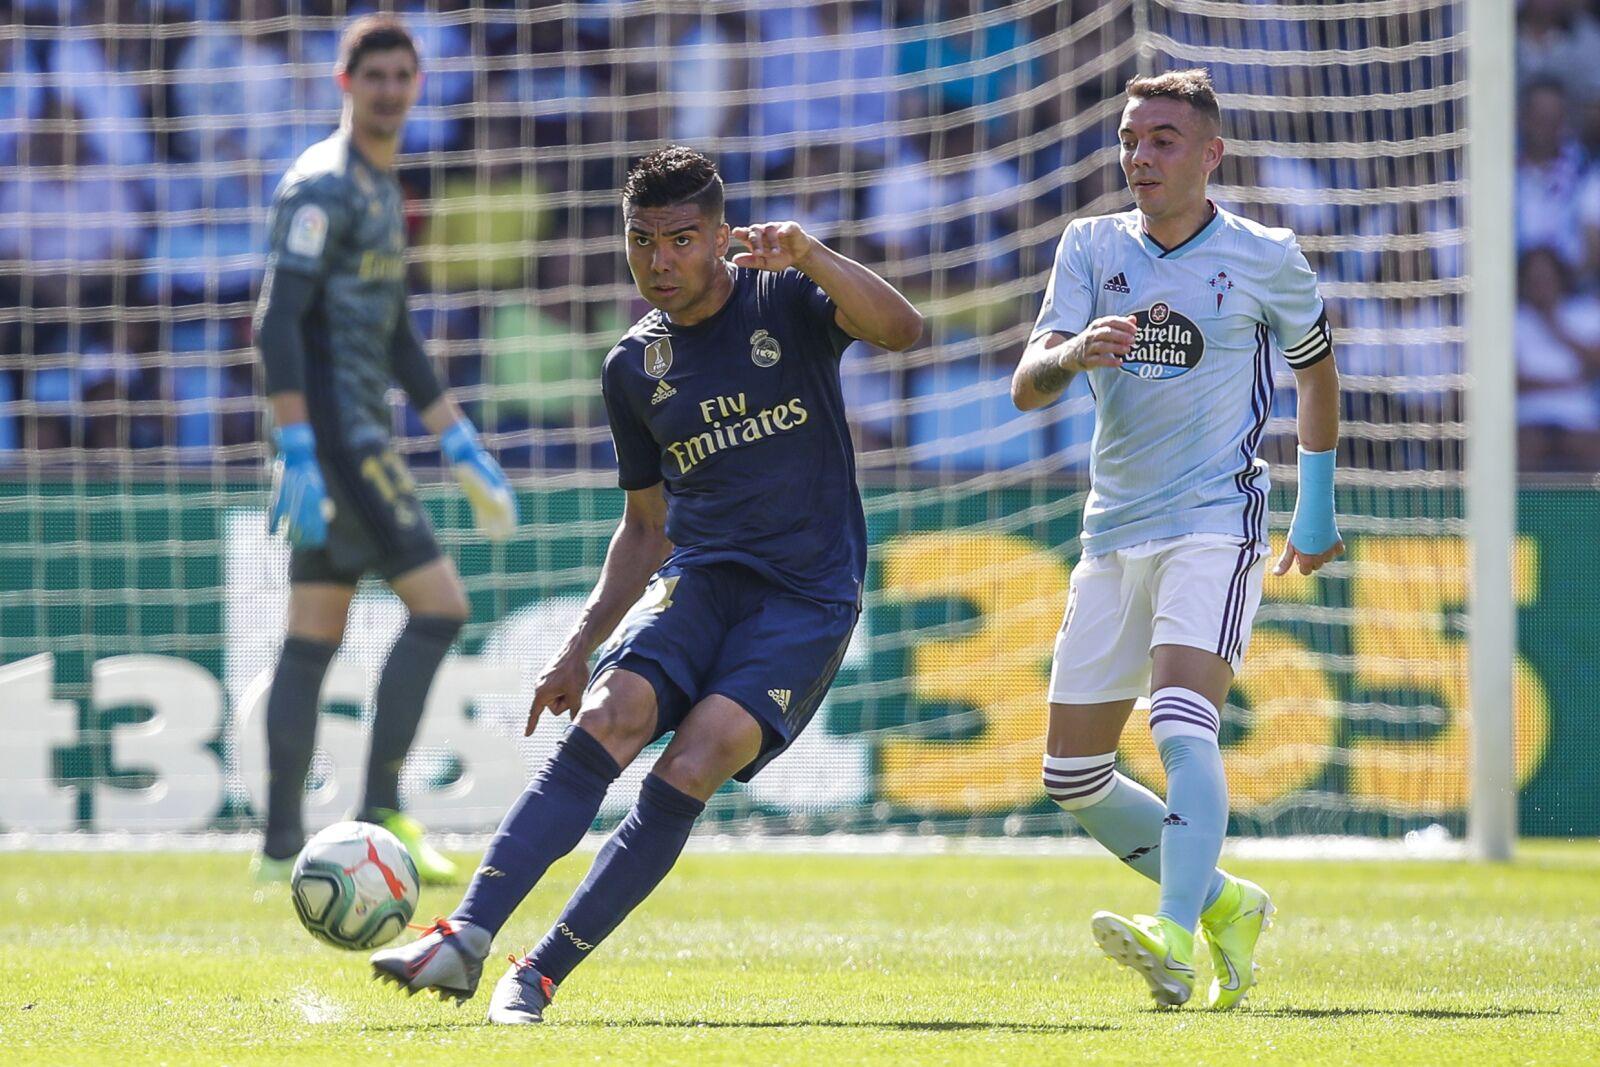 Real Madrid: Predicted Starting XI against Celta Vigo